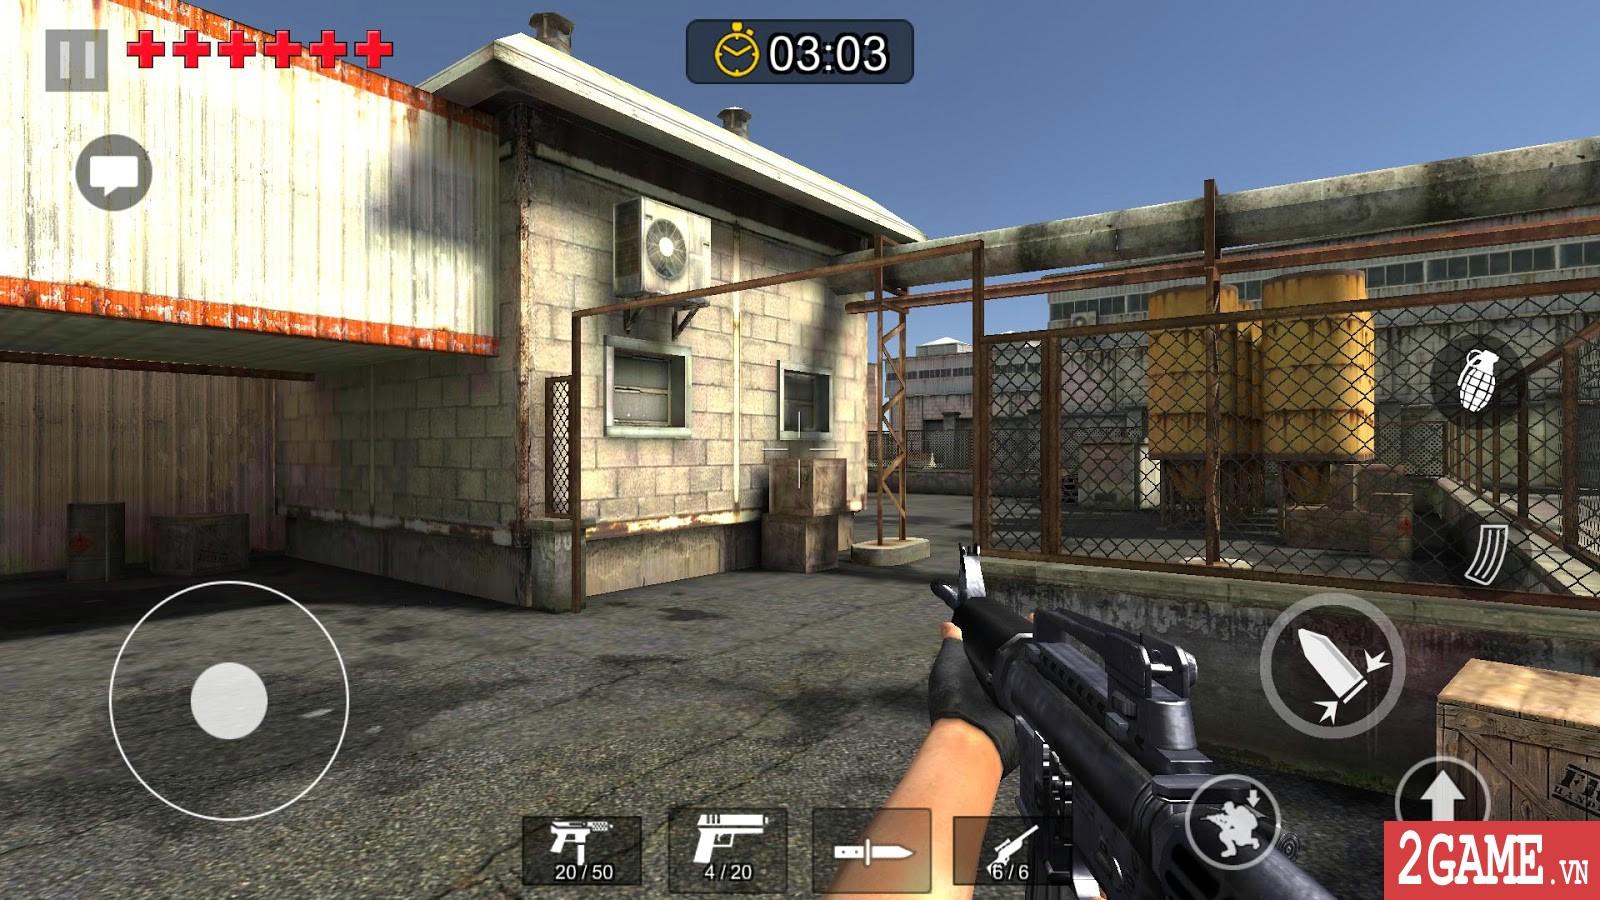 Trải nghiệm Legend Strike Online: Gợi nhớ về 1 thời Counter-Strike, Half-Life dữ dội 0